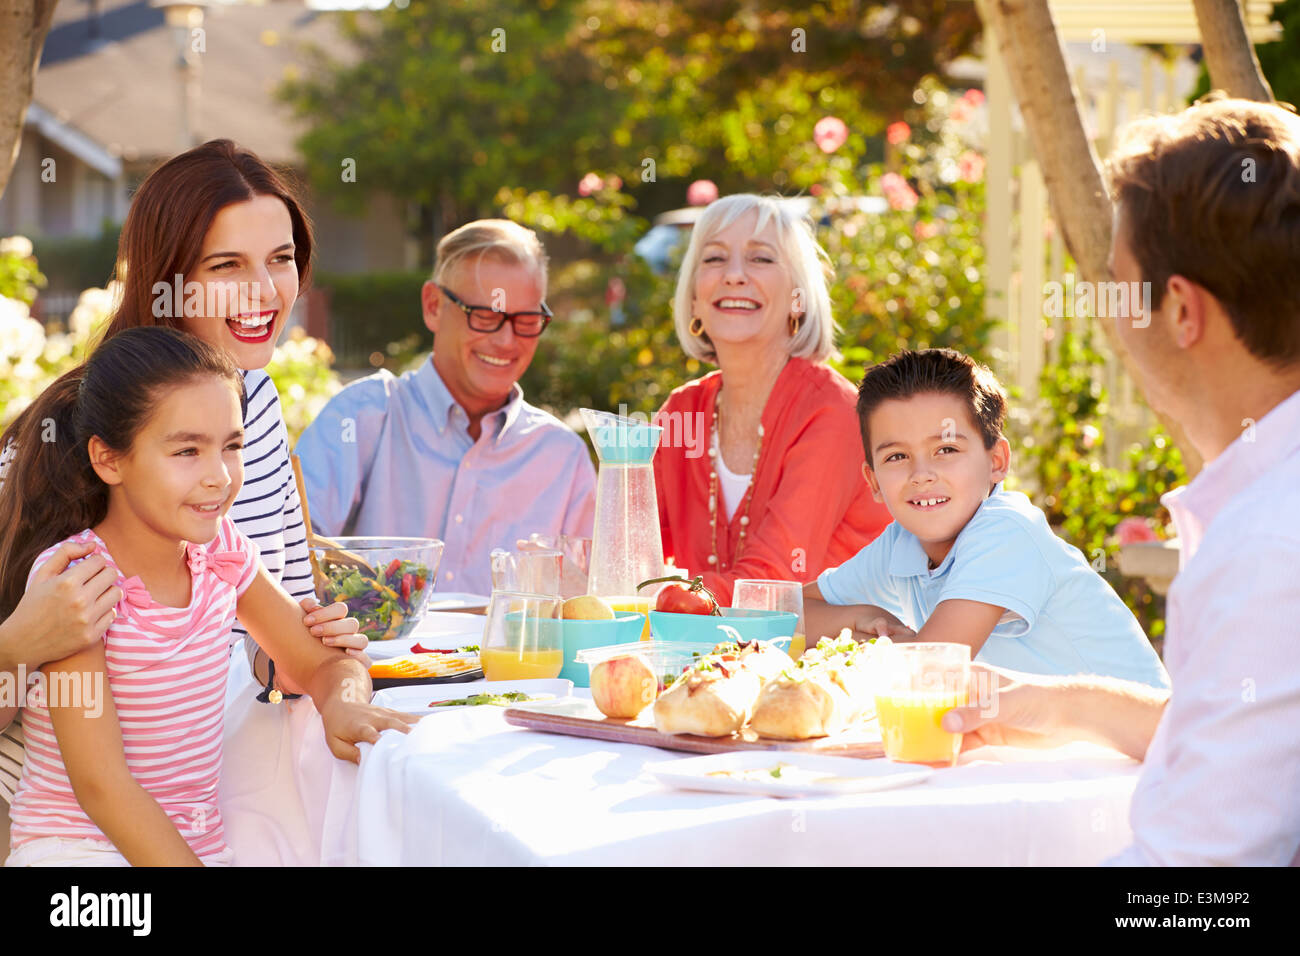 Multi-Generation Family Enjoying Outdoor Meal In Garden - Stock Image